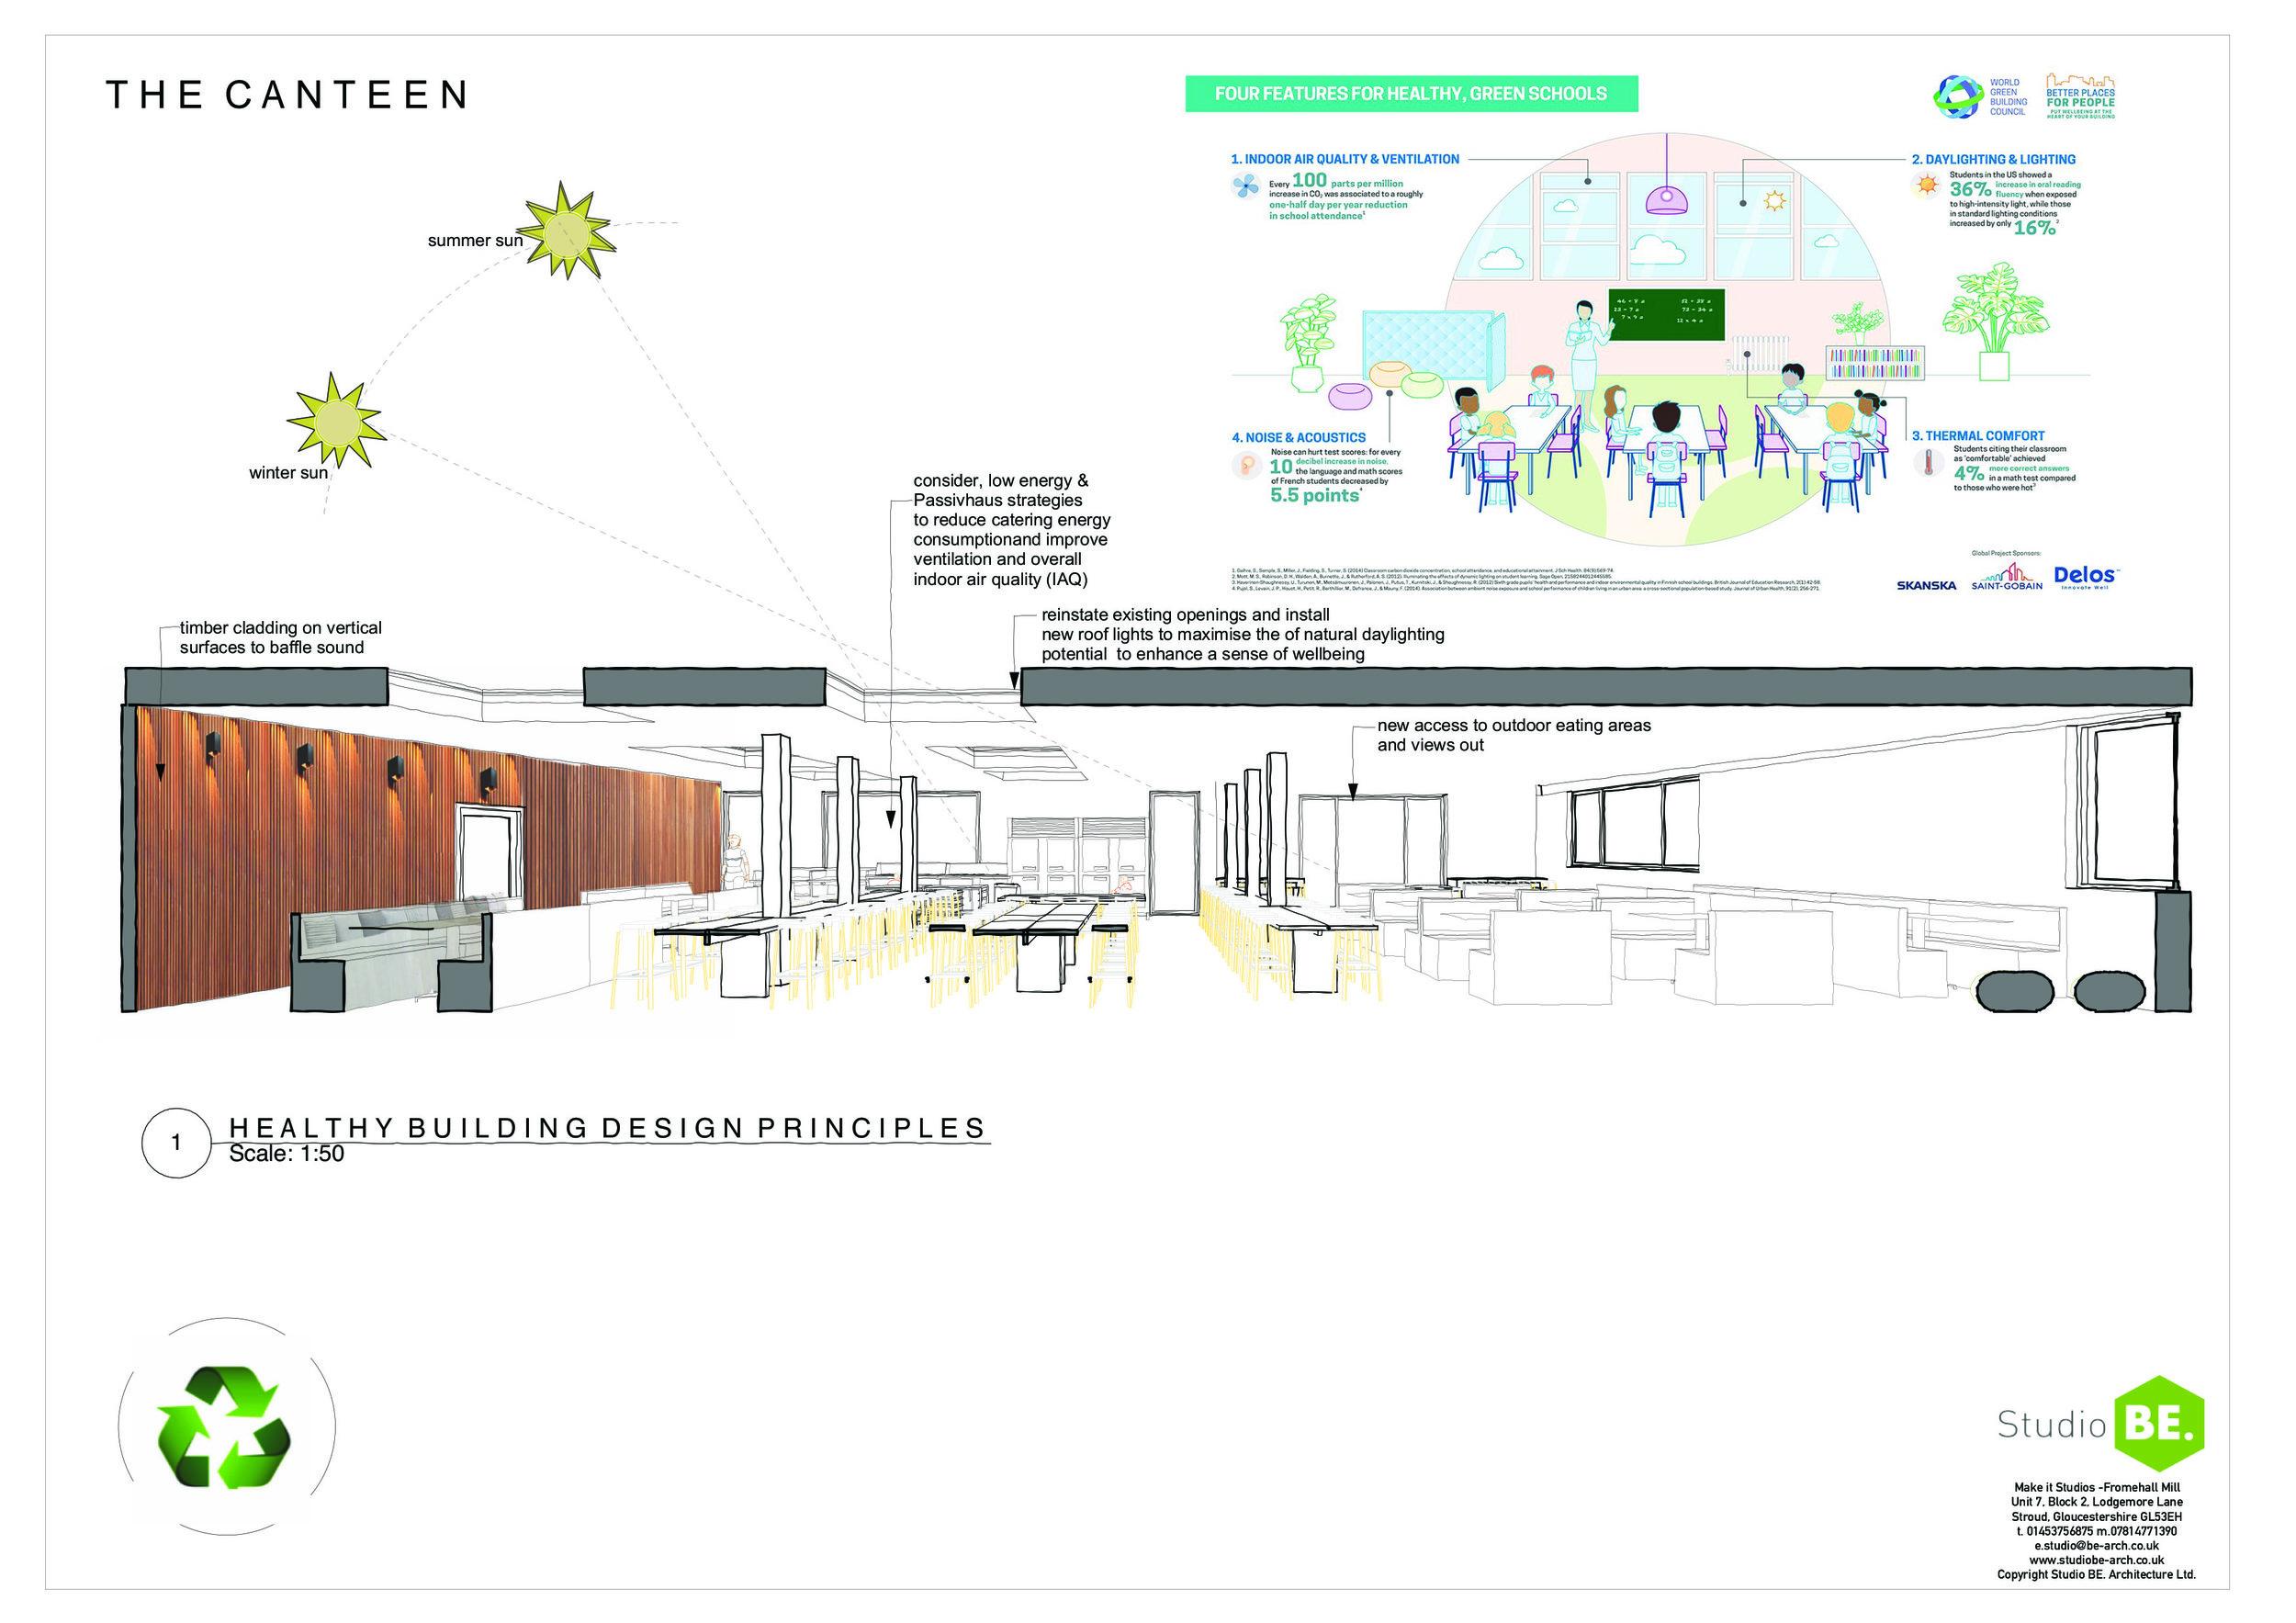 SWR Social Spaces Canteen healthy design principles.jpg